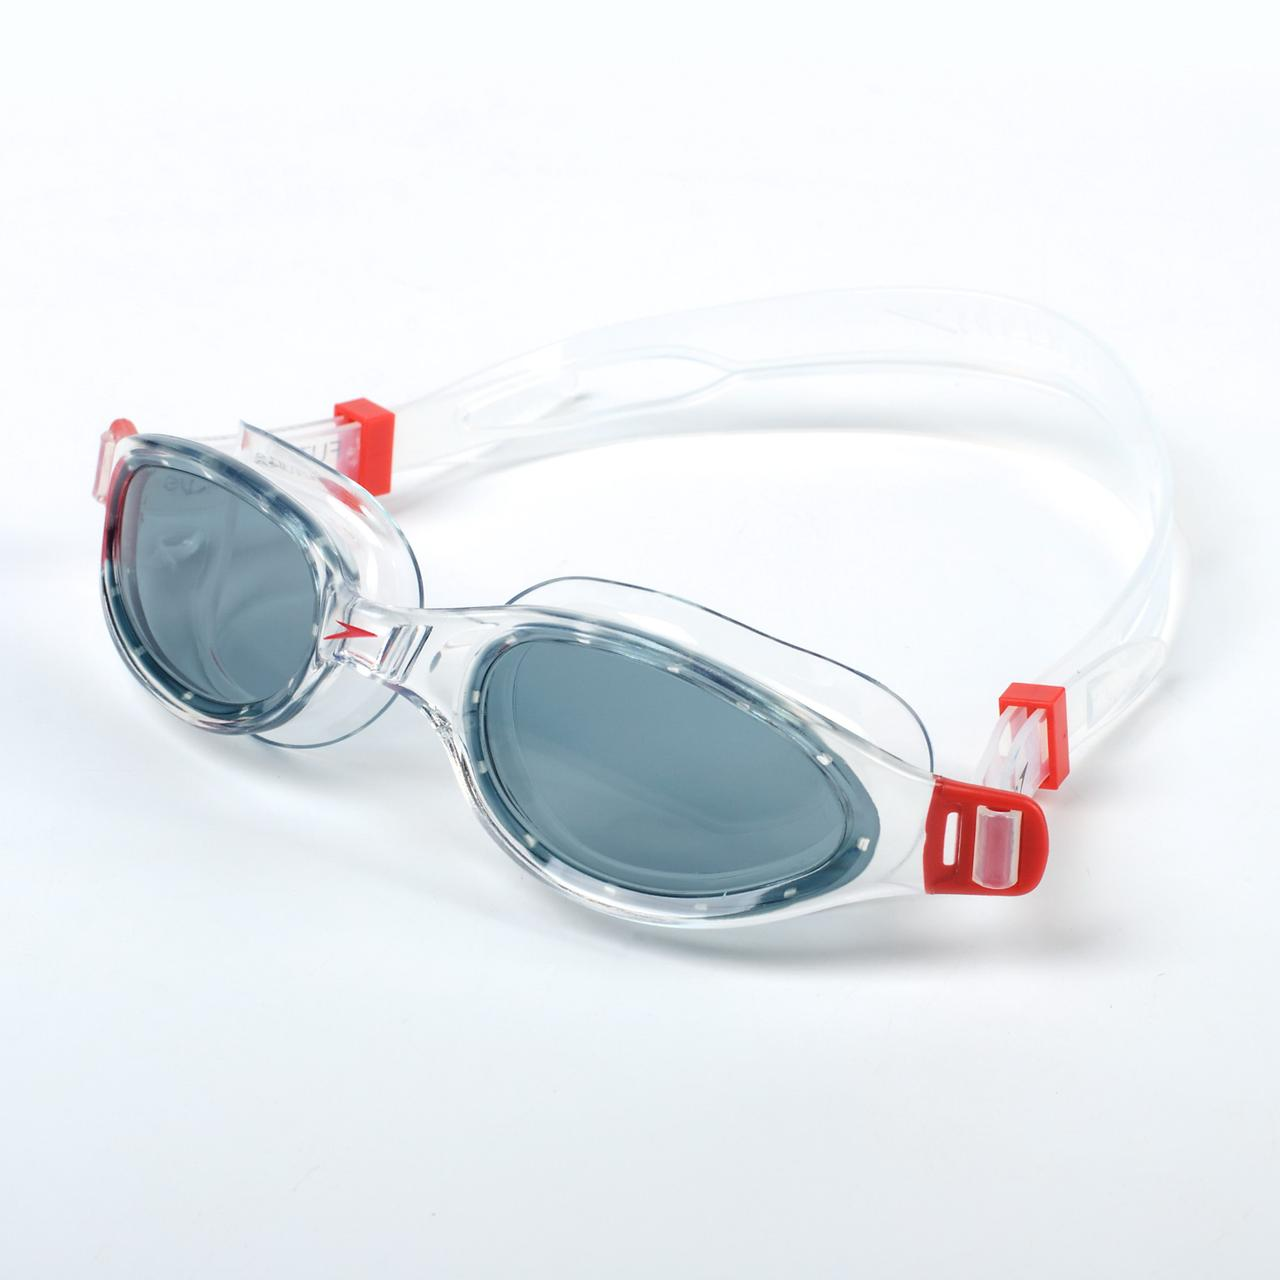 Очки для плавания SPEEDO FUTURA PLUS 8090093557 (поликарбонат, термопластичная резина, силикон, белый-серый)